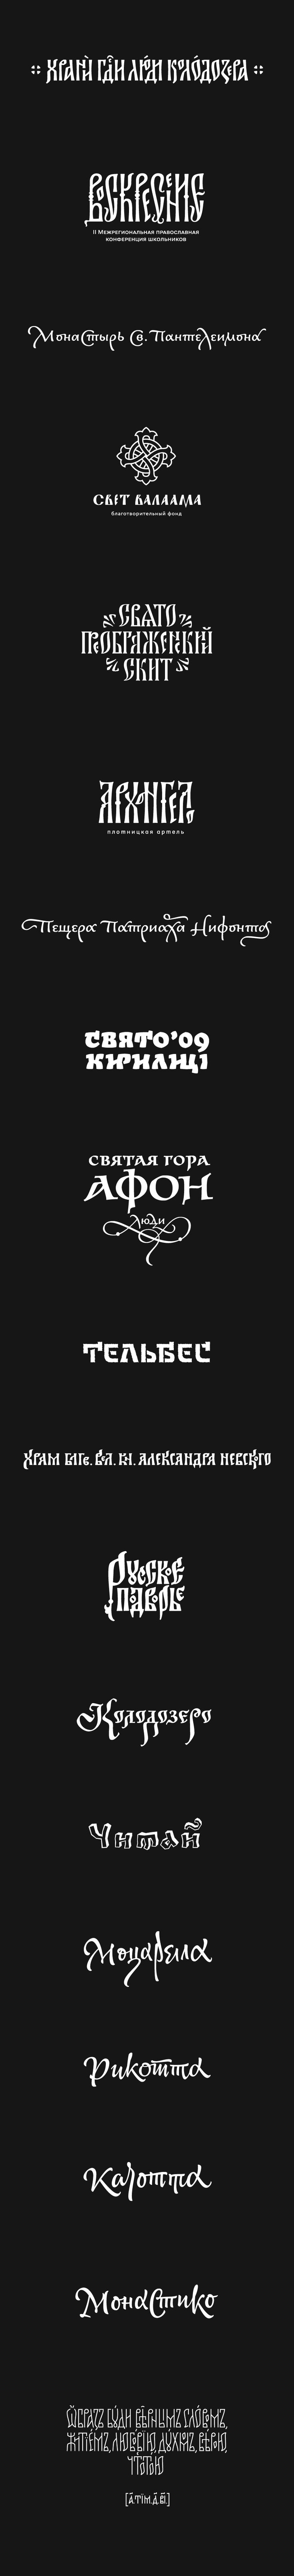 Славянские логотипы и леттеринг, Логотип © Олег Мацуев